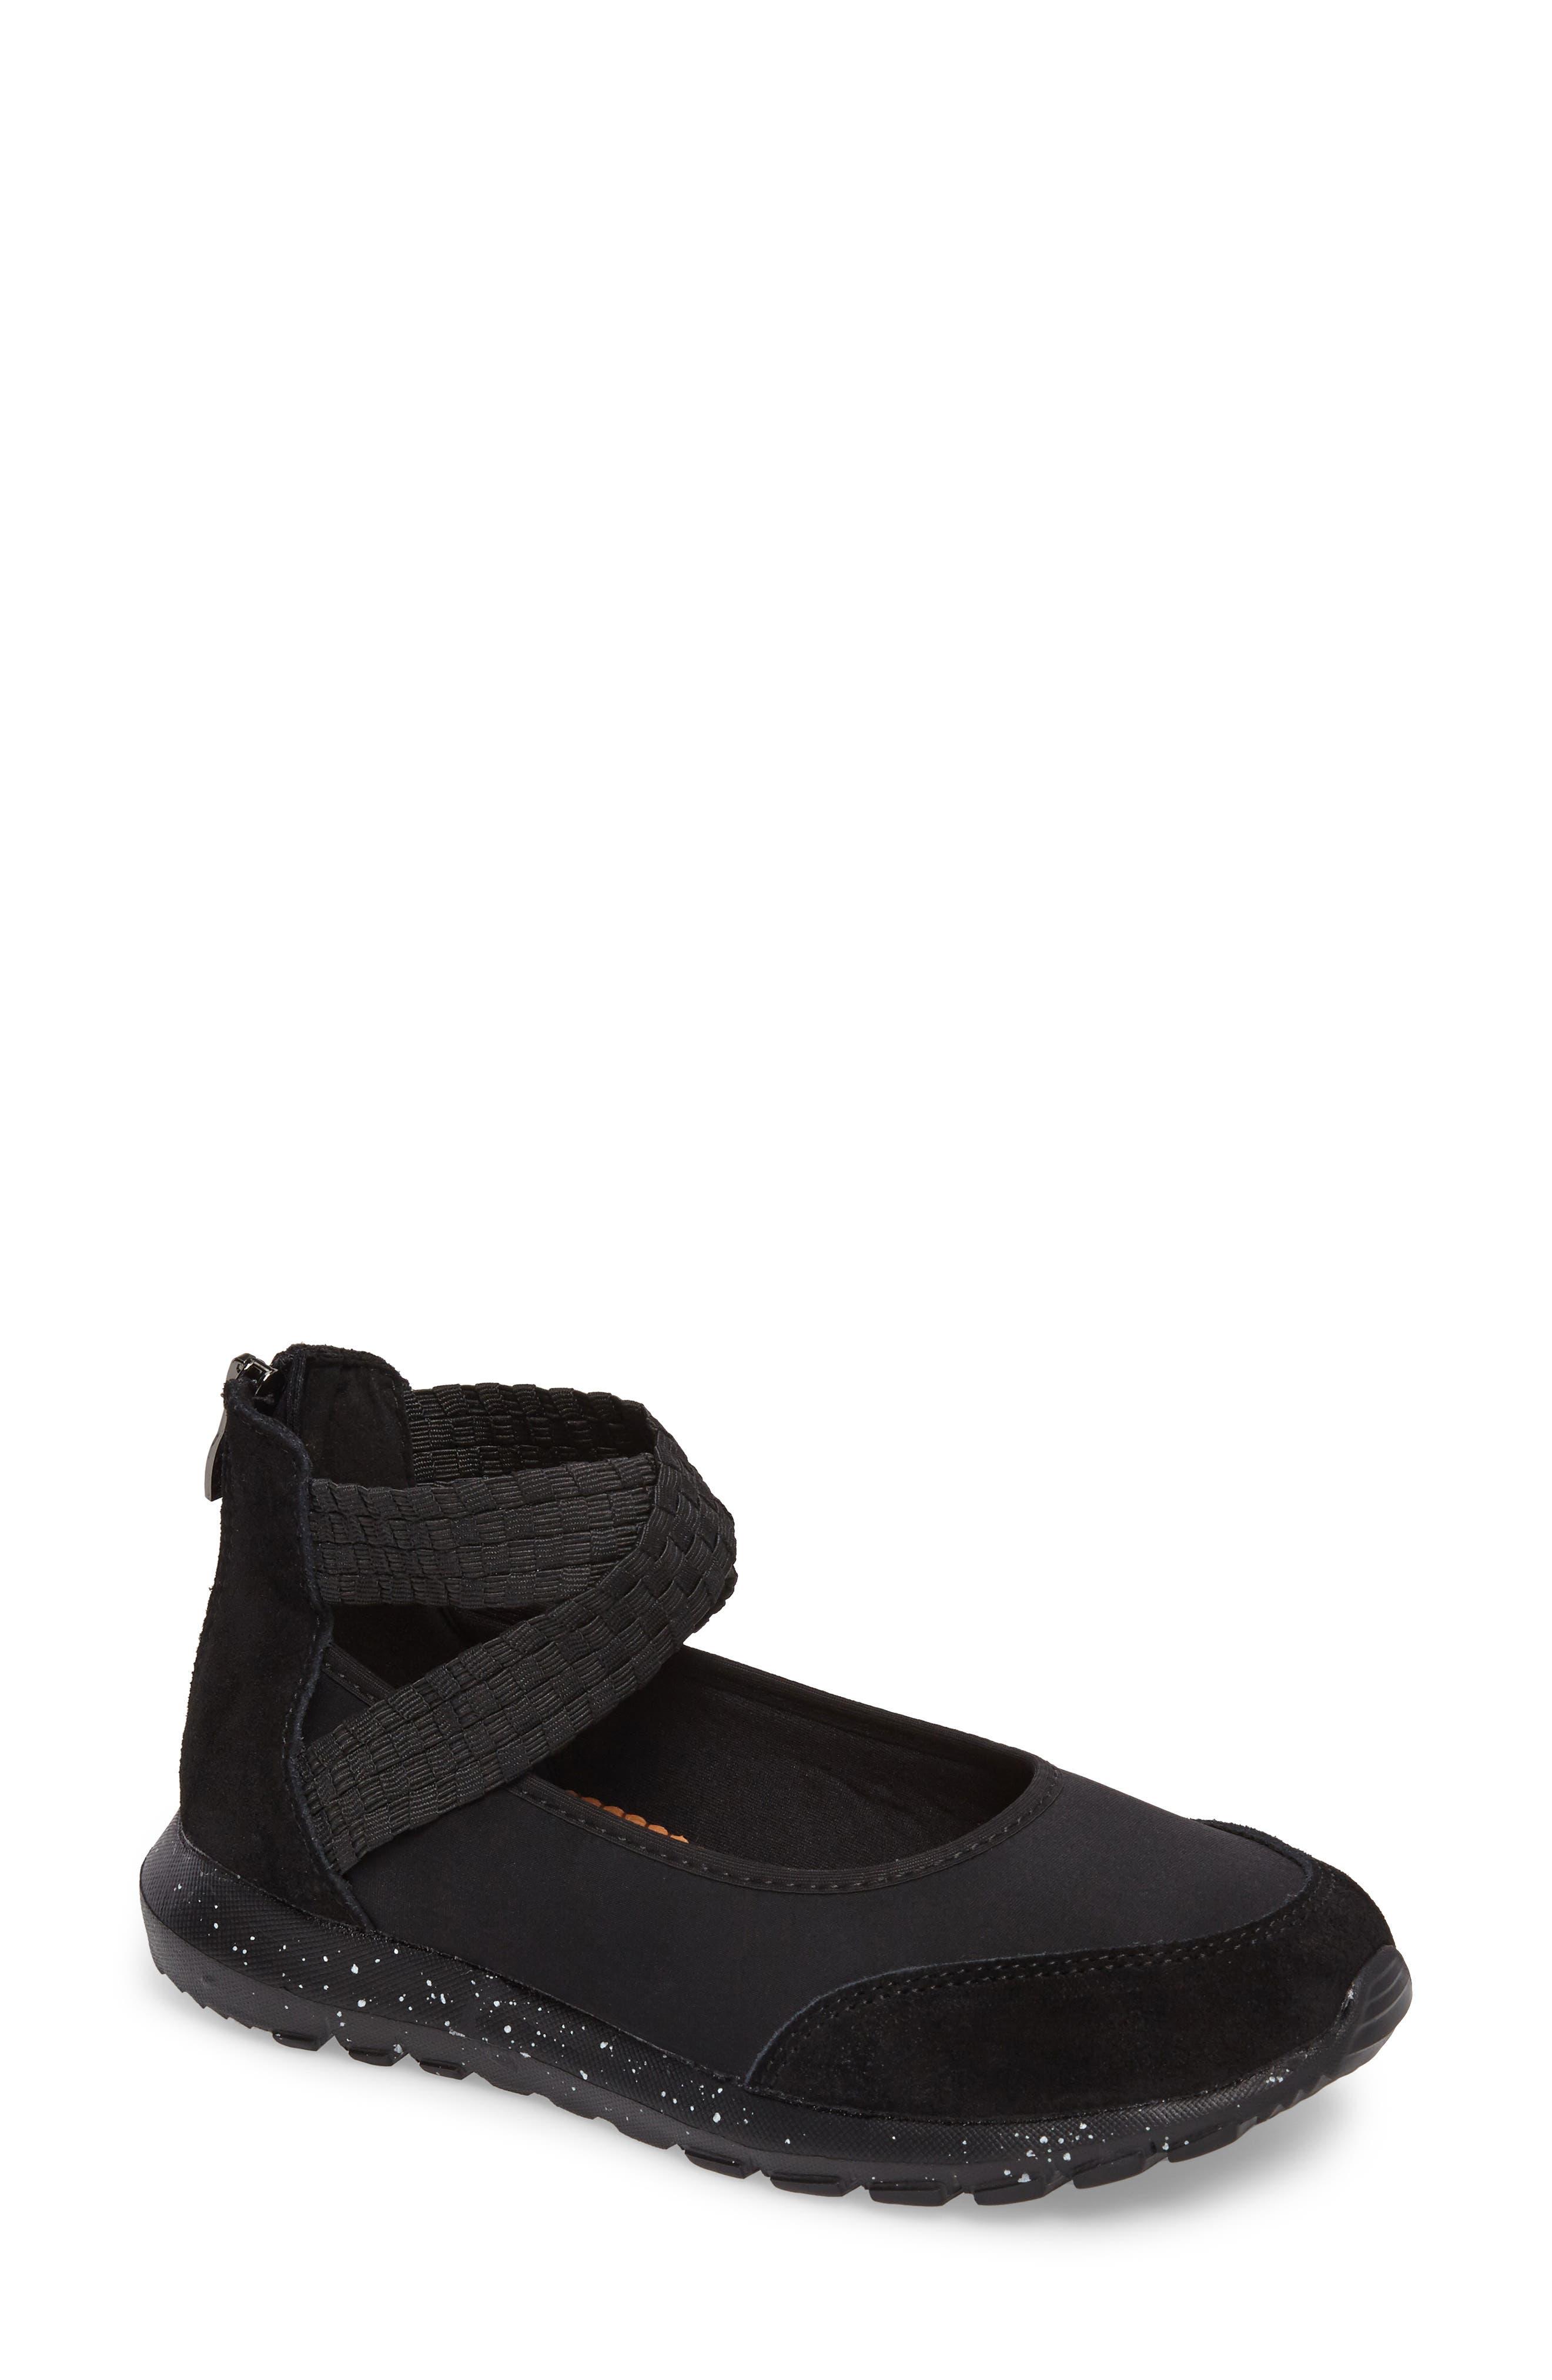 Bernie Mev Runner Flow Sneaker,                         Main,                         color, 001